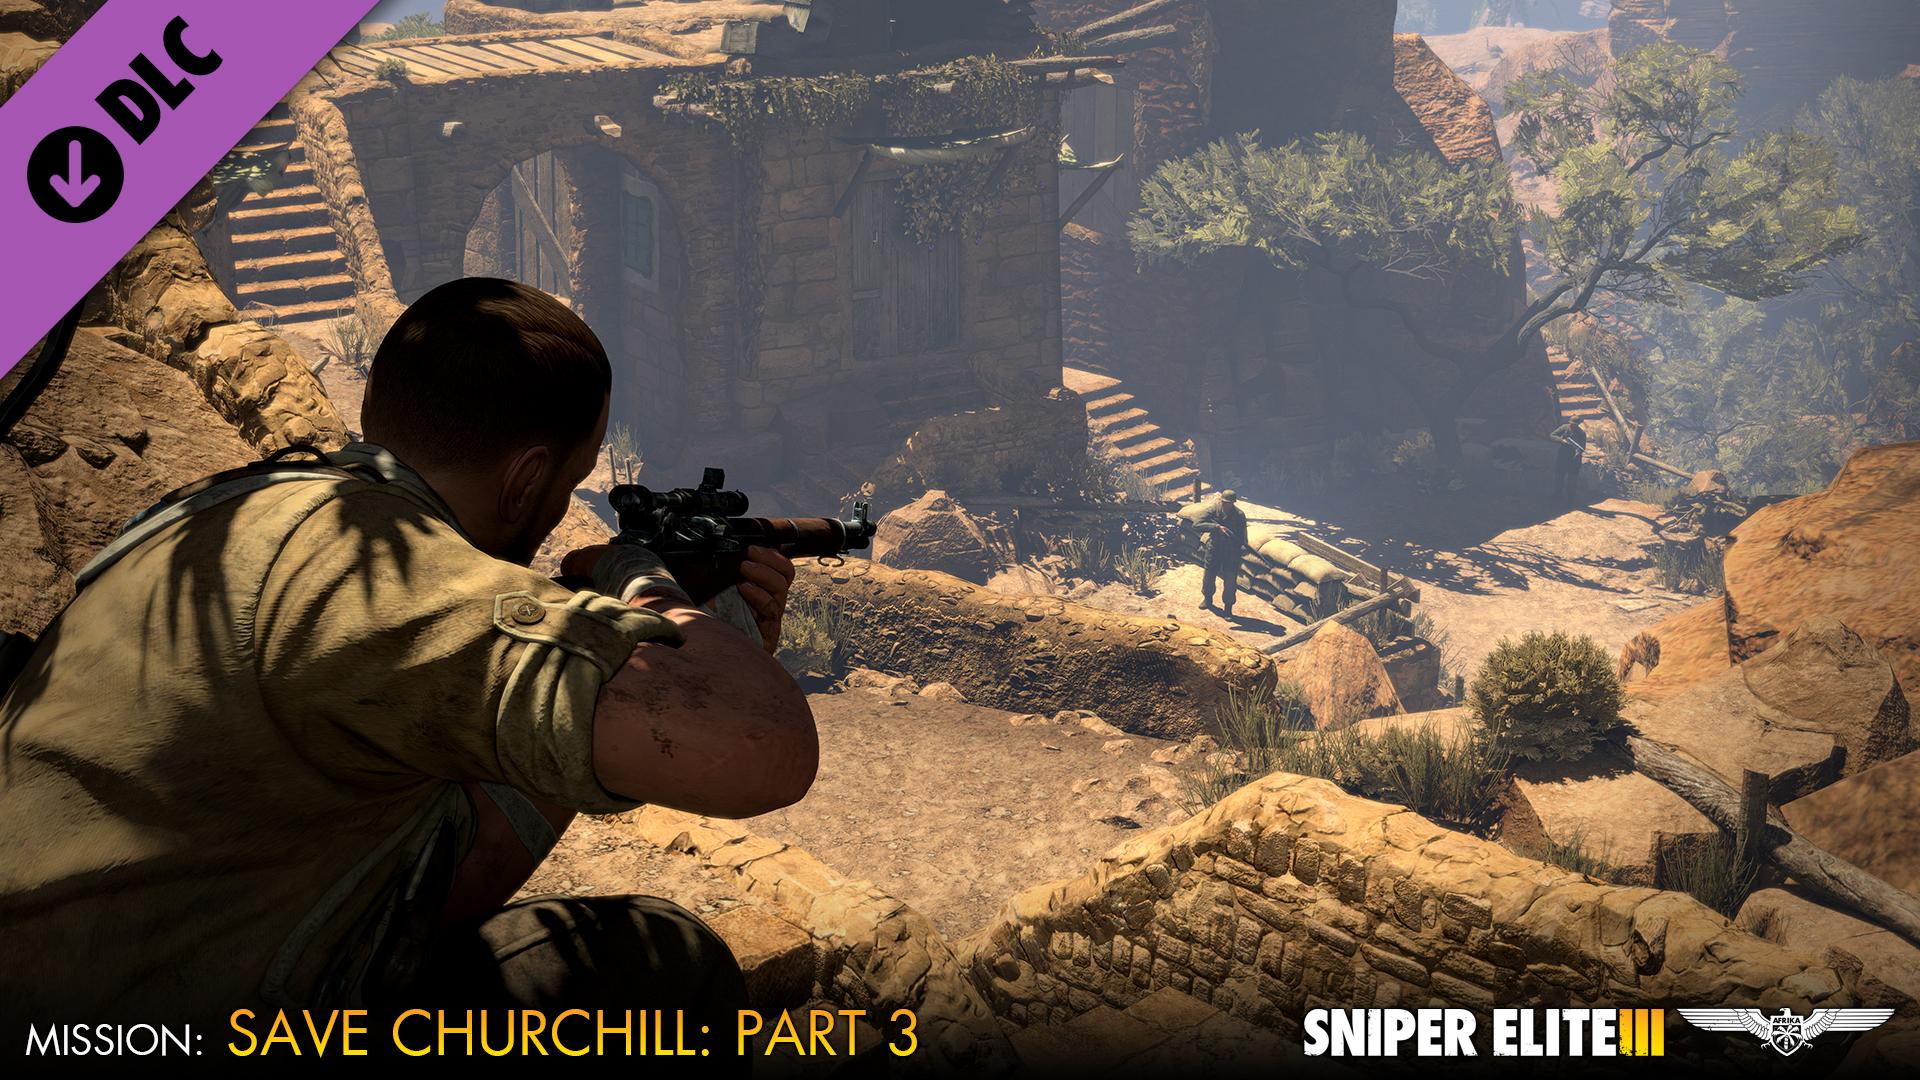 Sniper Elite 3 - Save Churchill Part 3: Confrontation screenshot